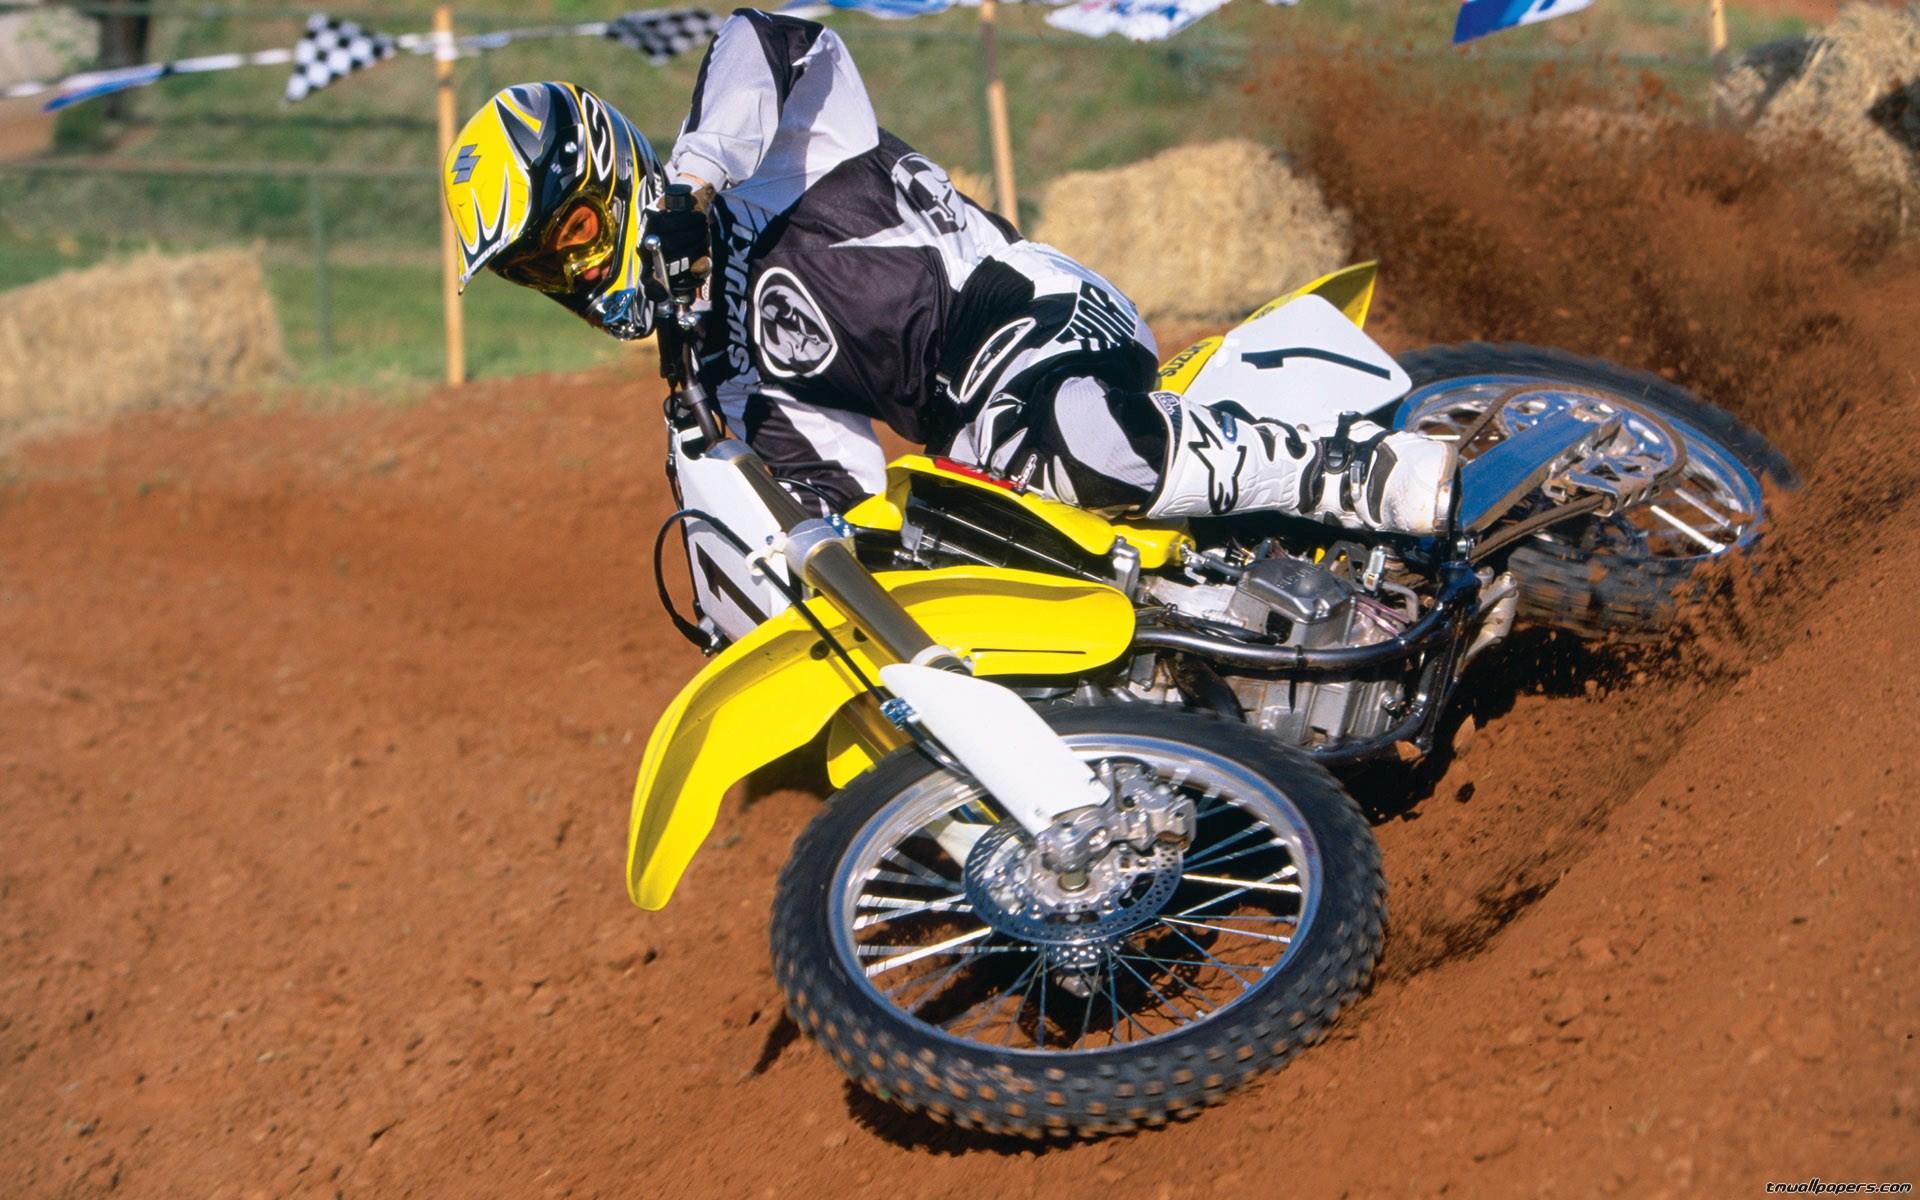 Hd Wallpapers Motocross Pin Up Girls 1000 X 666 180 Kb Jpeg HD 1920x1200